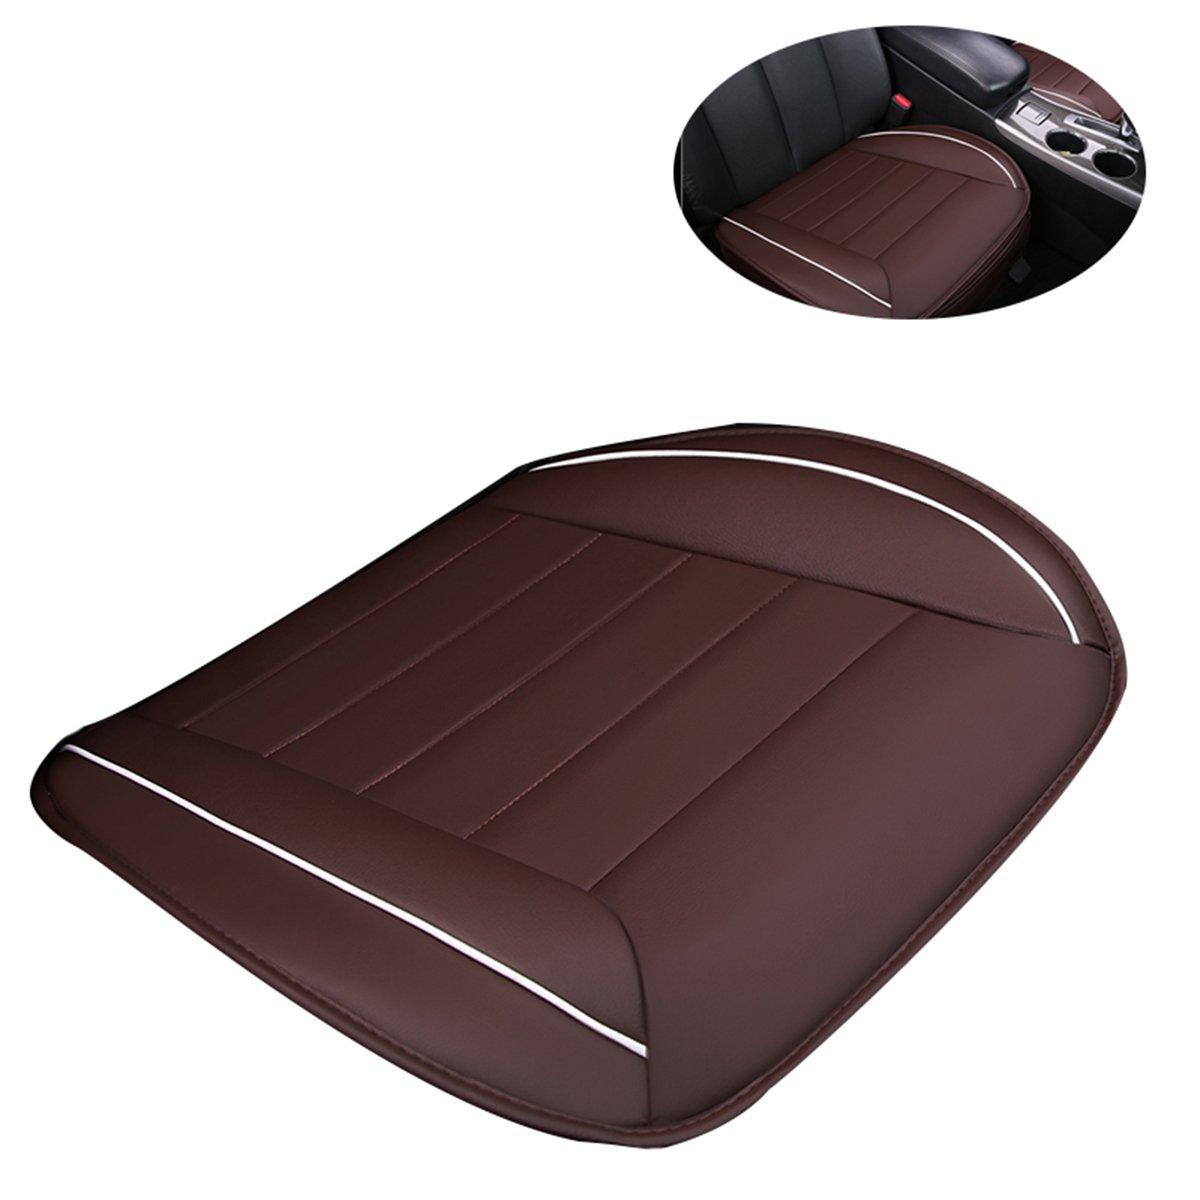 Caf/é WINOMO Tapa para silla coche universal de cuero Coj/ín Asiento Coche